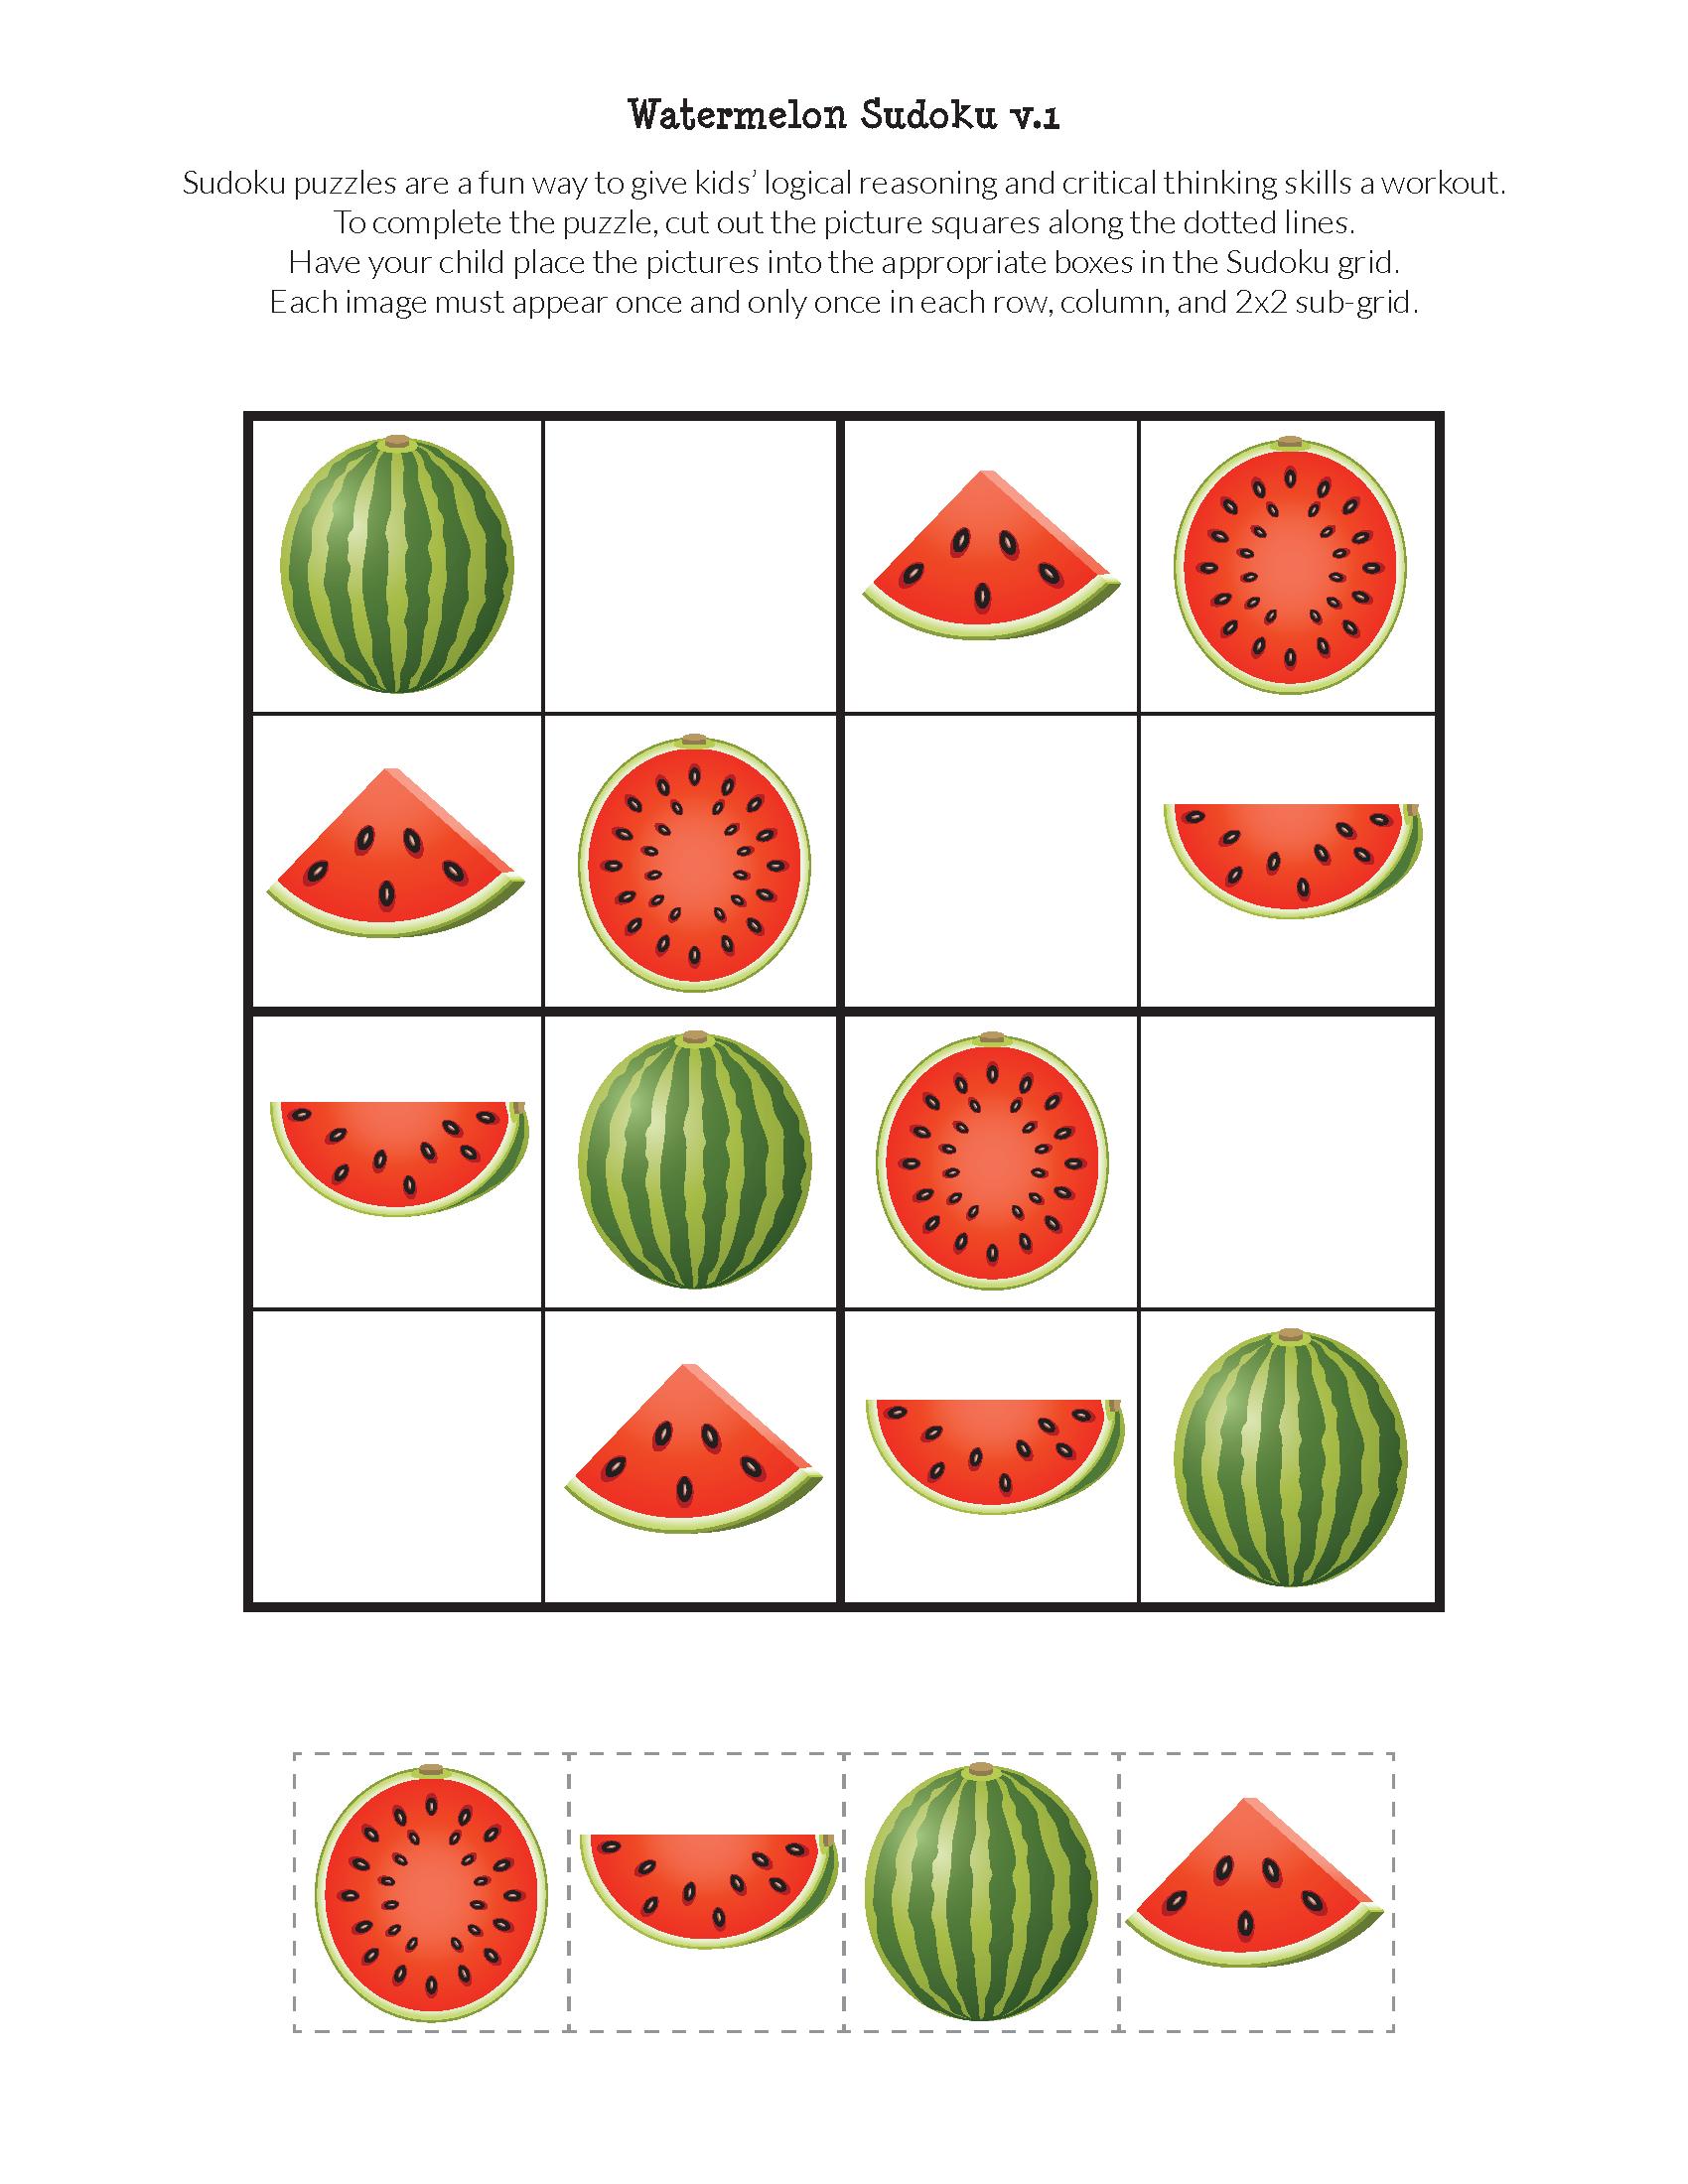 Watermelon Sudoku Puzzles Free Printables Sudoku Puzzles Sudoku Printable Puzzles For Kids [ 2200 x 1700 Pixel ]